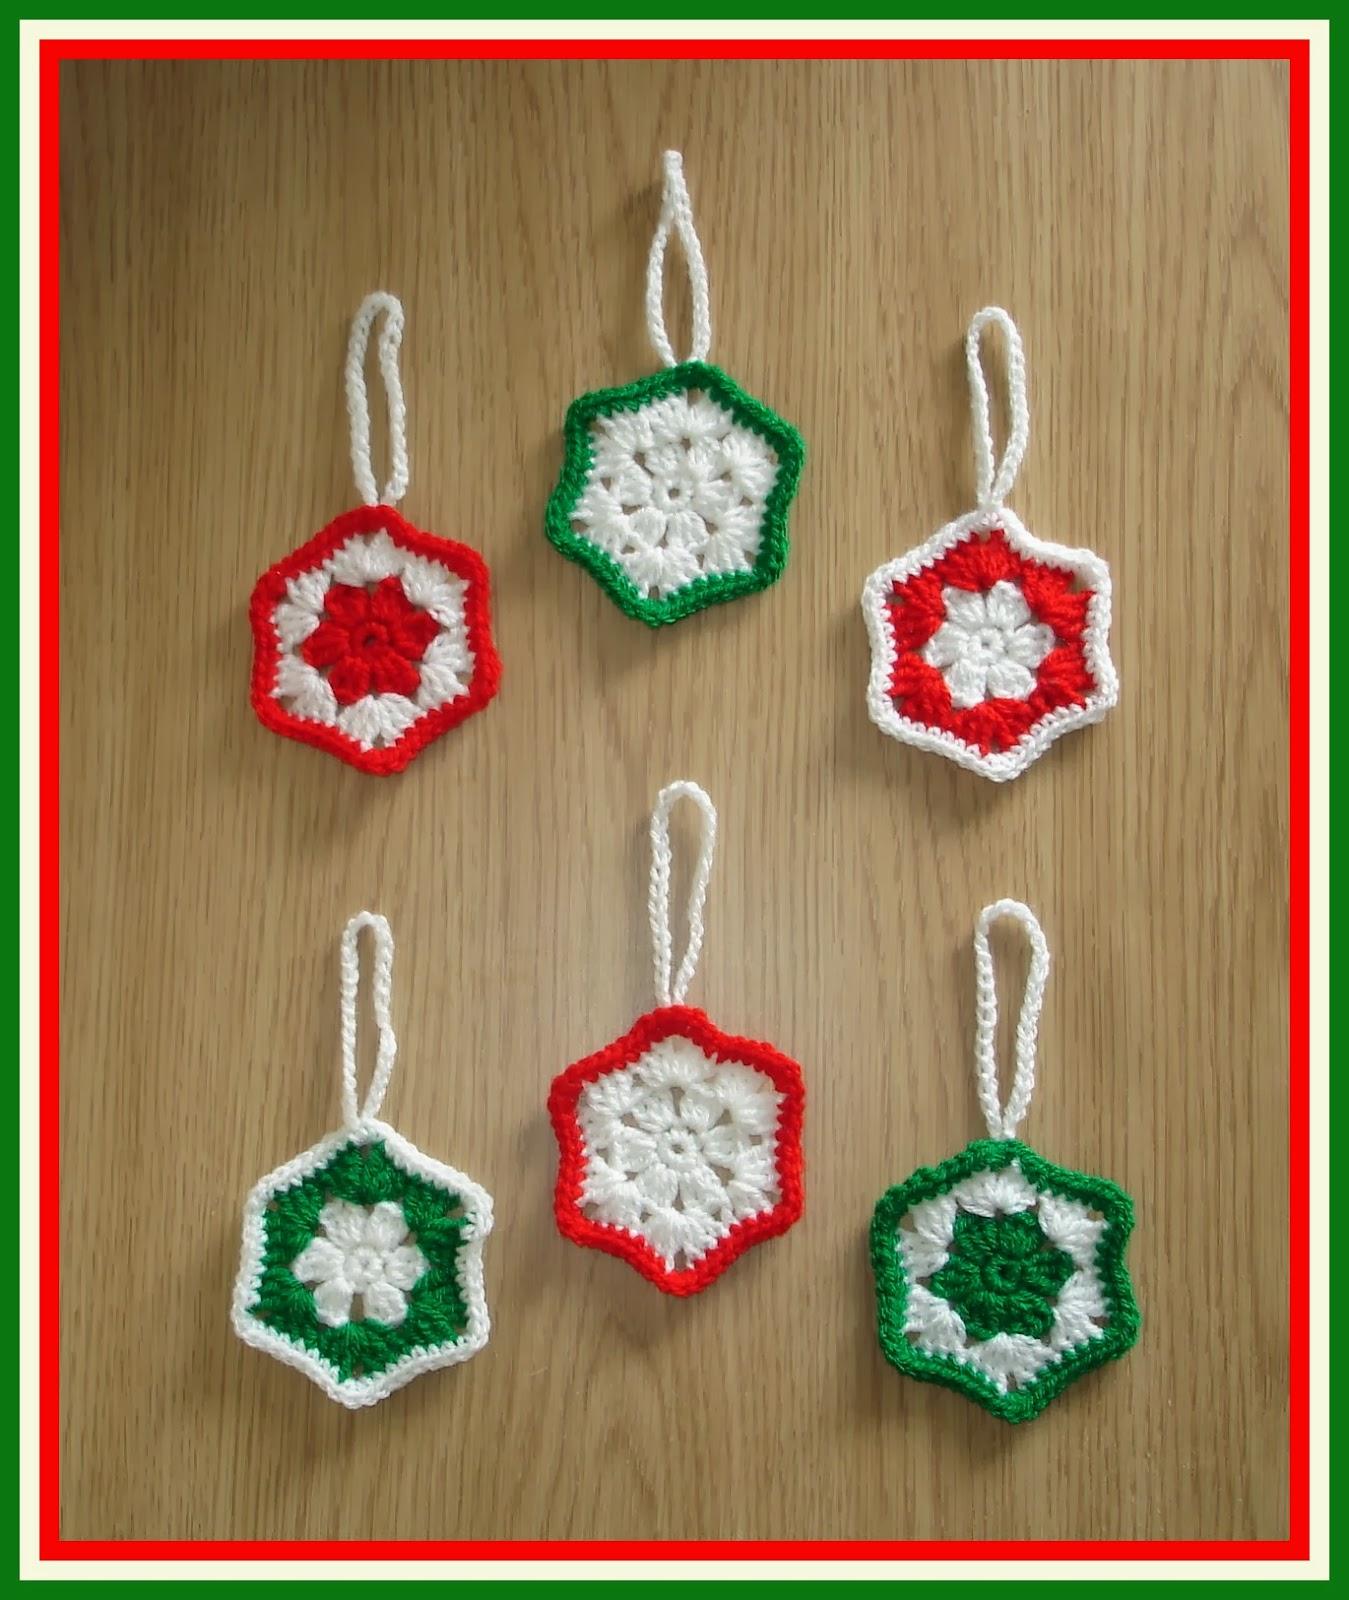 Best Christmas Decoration Malaysia 2013: Marianna's Lazy Daisy Days: Easy Snowflake Christmas